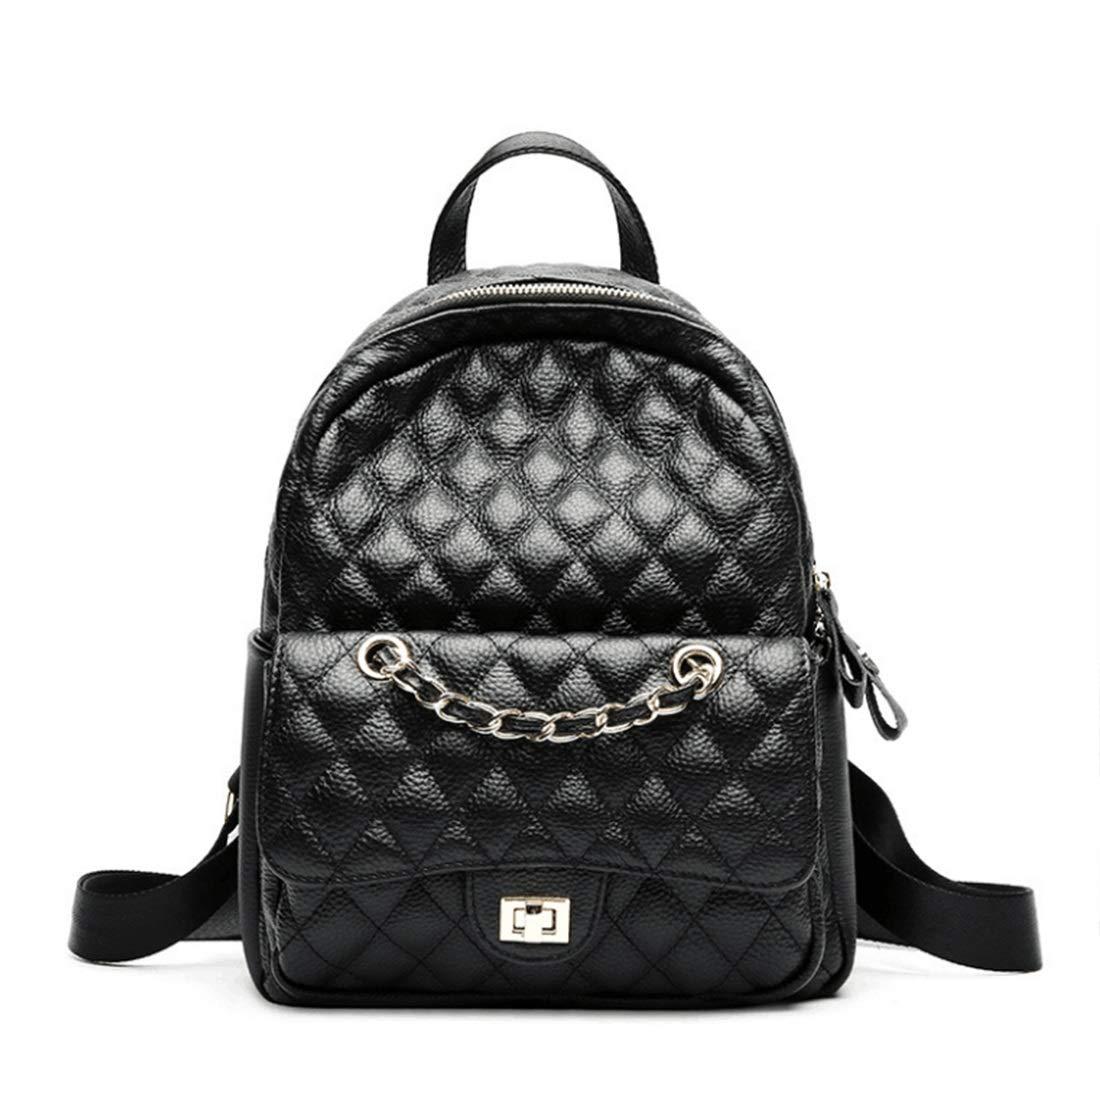 CAFUTY 女性のバッグバックパック財布レザースクールバッグカジュアルデイパックショルダーバッグ (Color : ブラック)  ブラック B07PQB7R6J